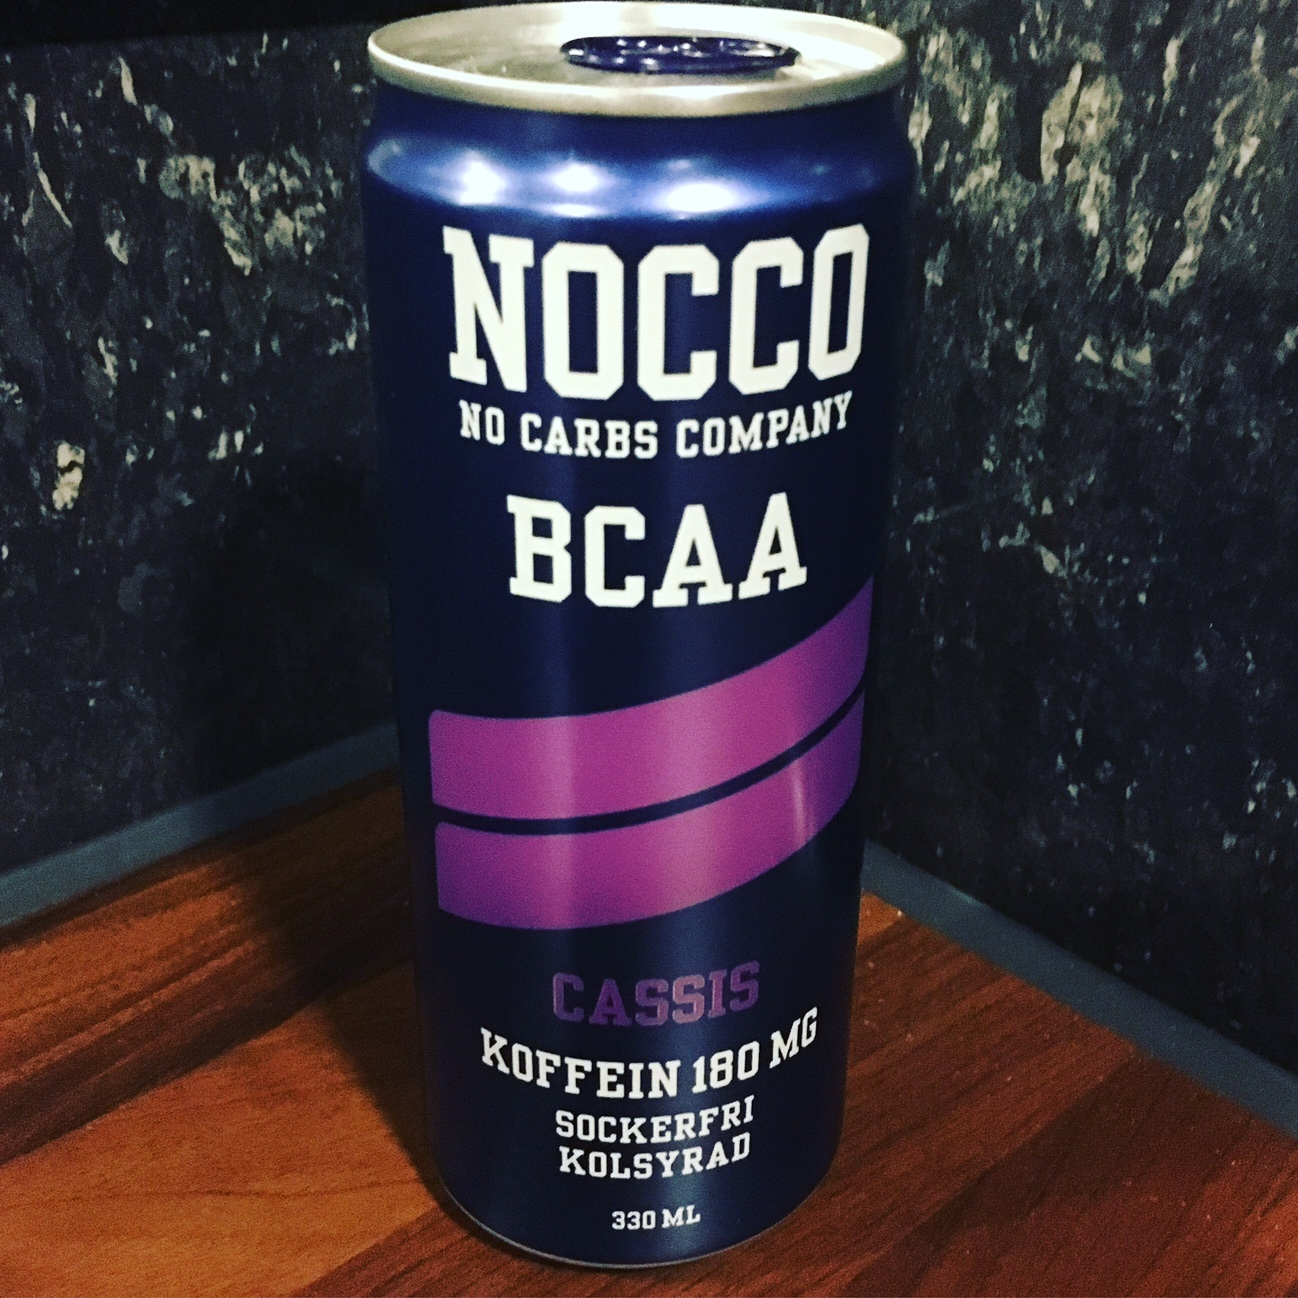 NOCCO BCAA Cassis